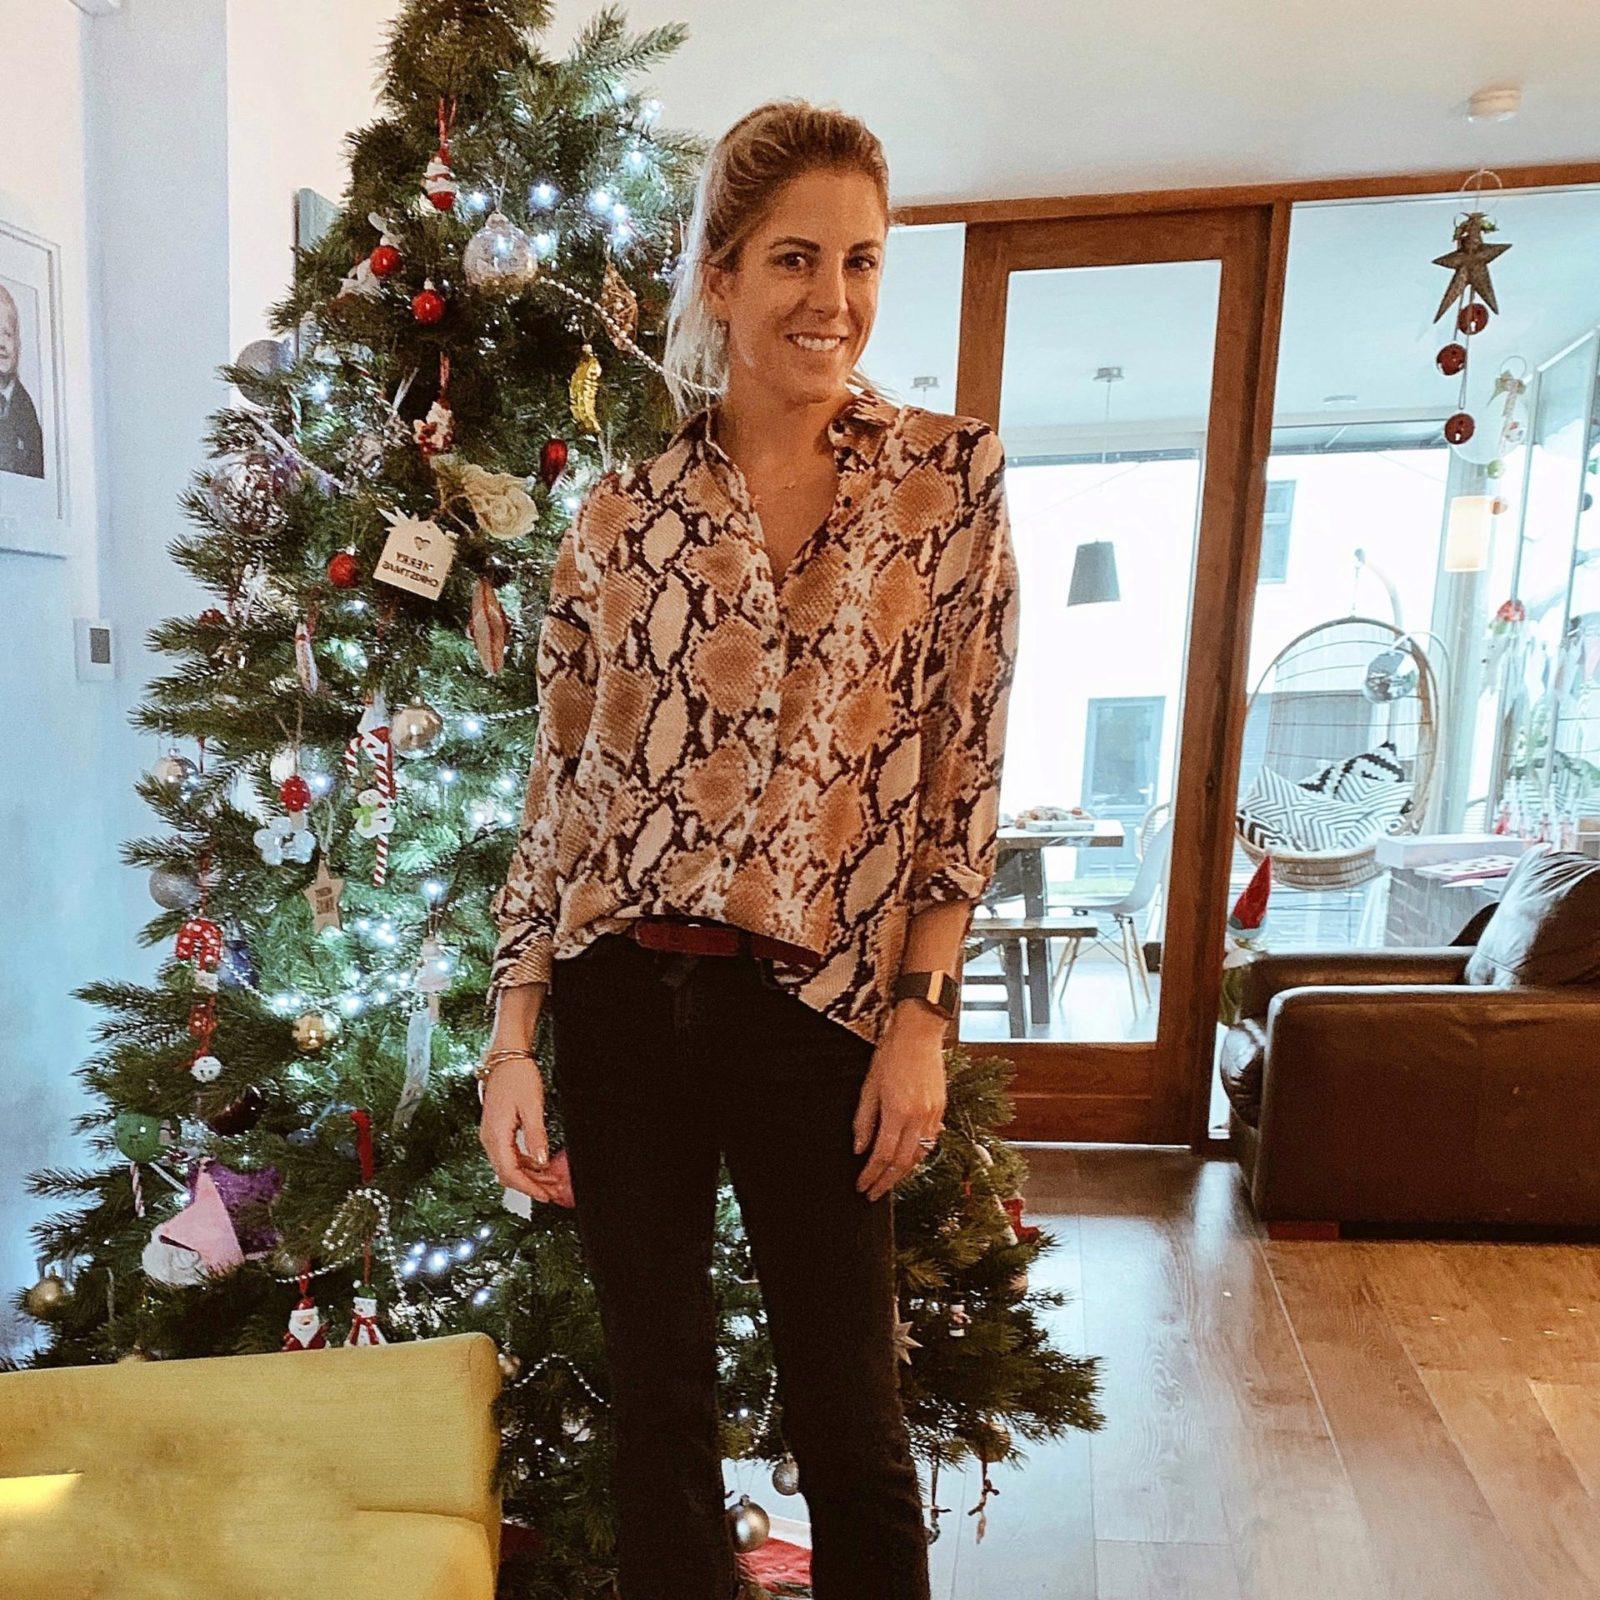 Cliona O'Connor leanmeanmomma Marks & Spencer Ireland